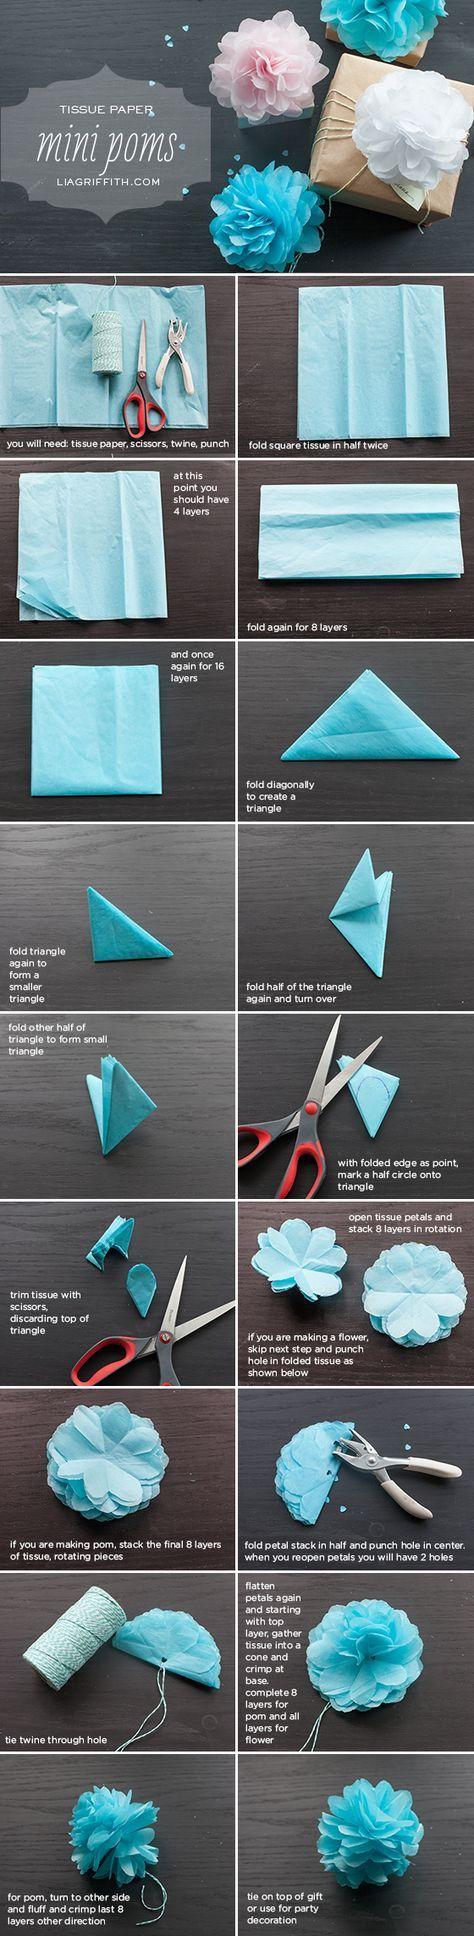 Inspirational Monday - Do it yourself (diy) Flower series - DIY Tissue paper mini pom pom